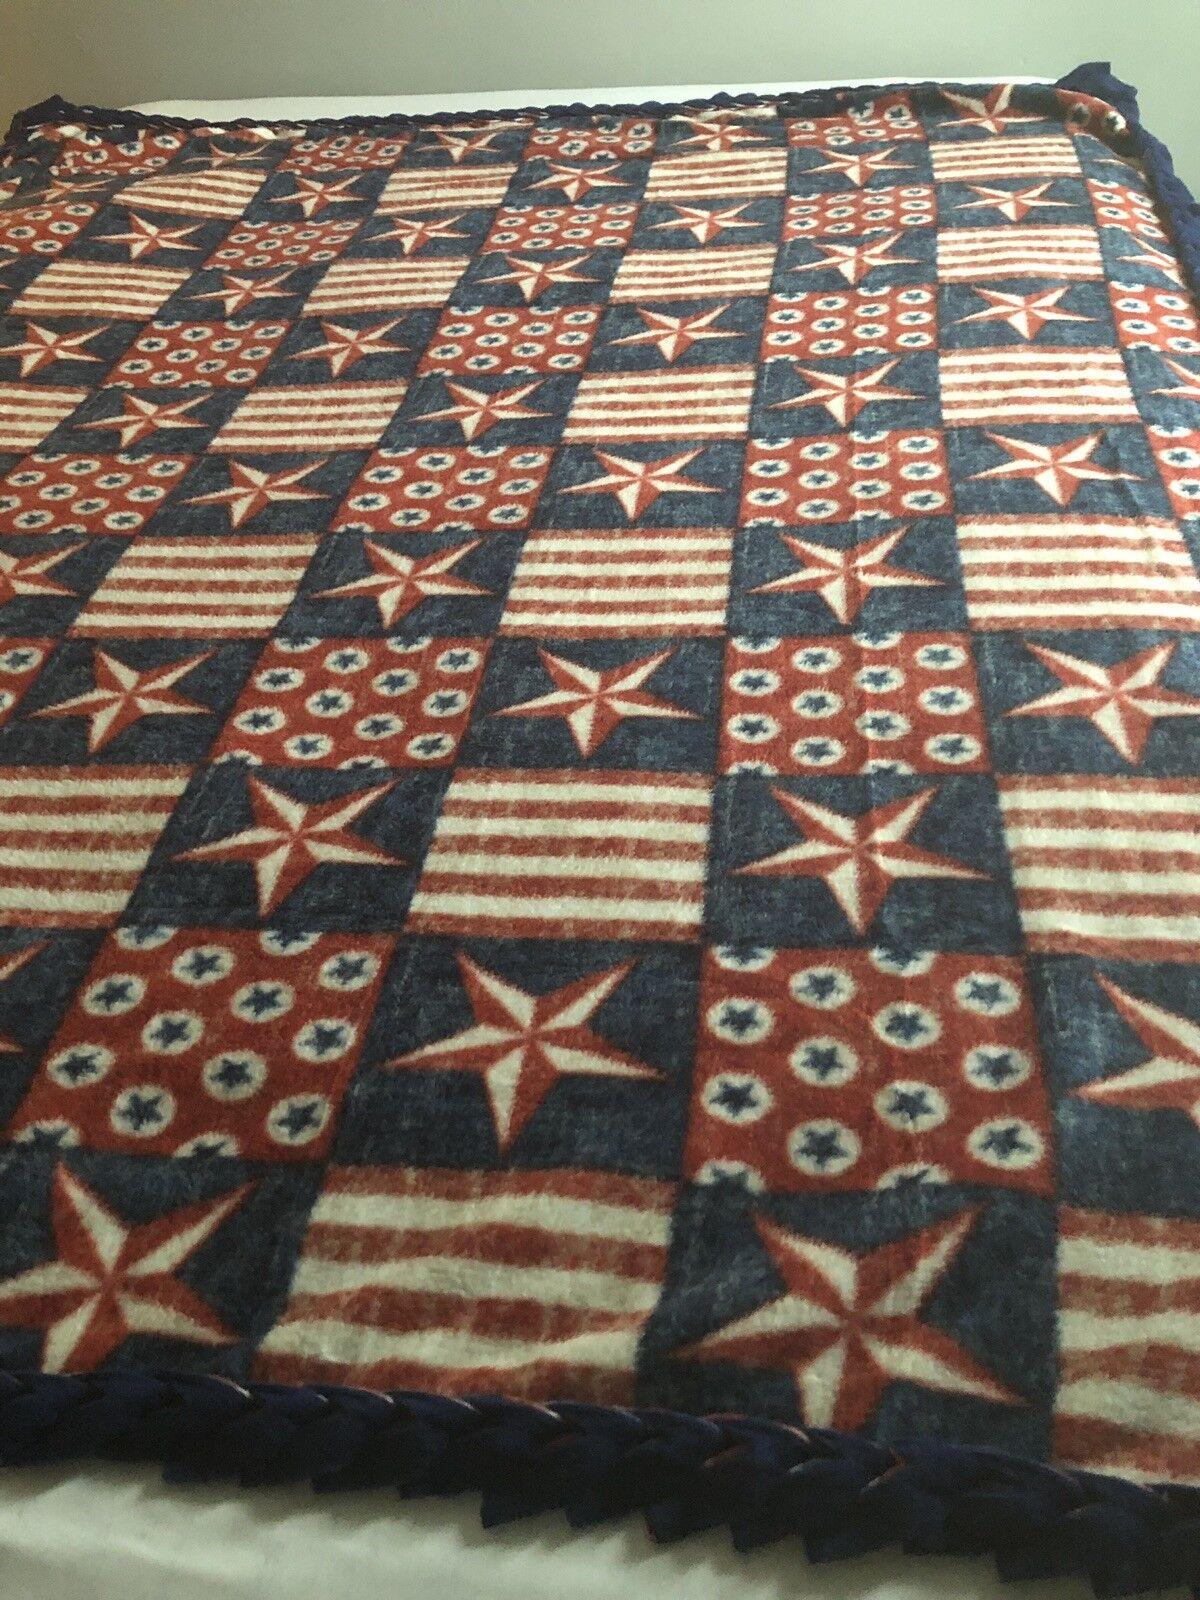 Stars And Stripes Handmade Fleece Blanket With Braided Edge